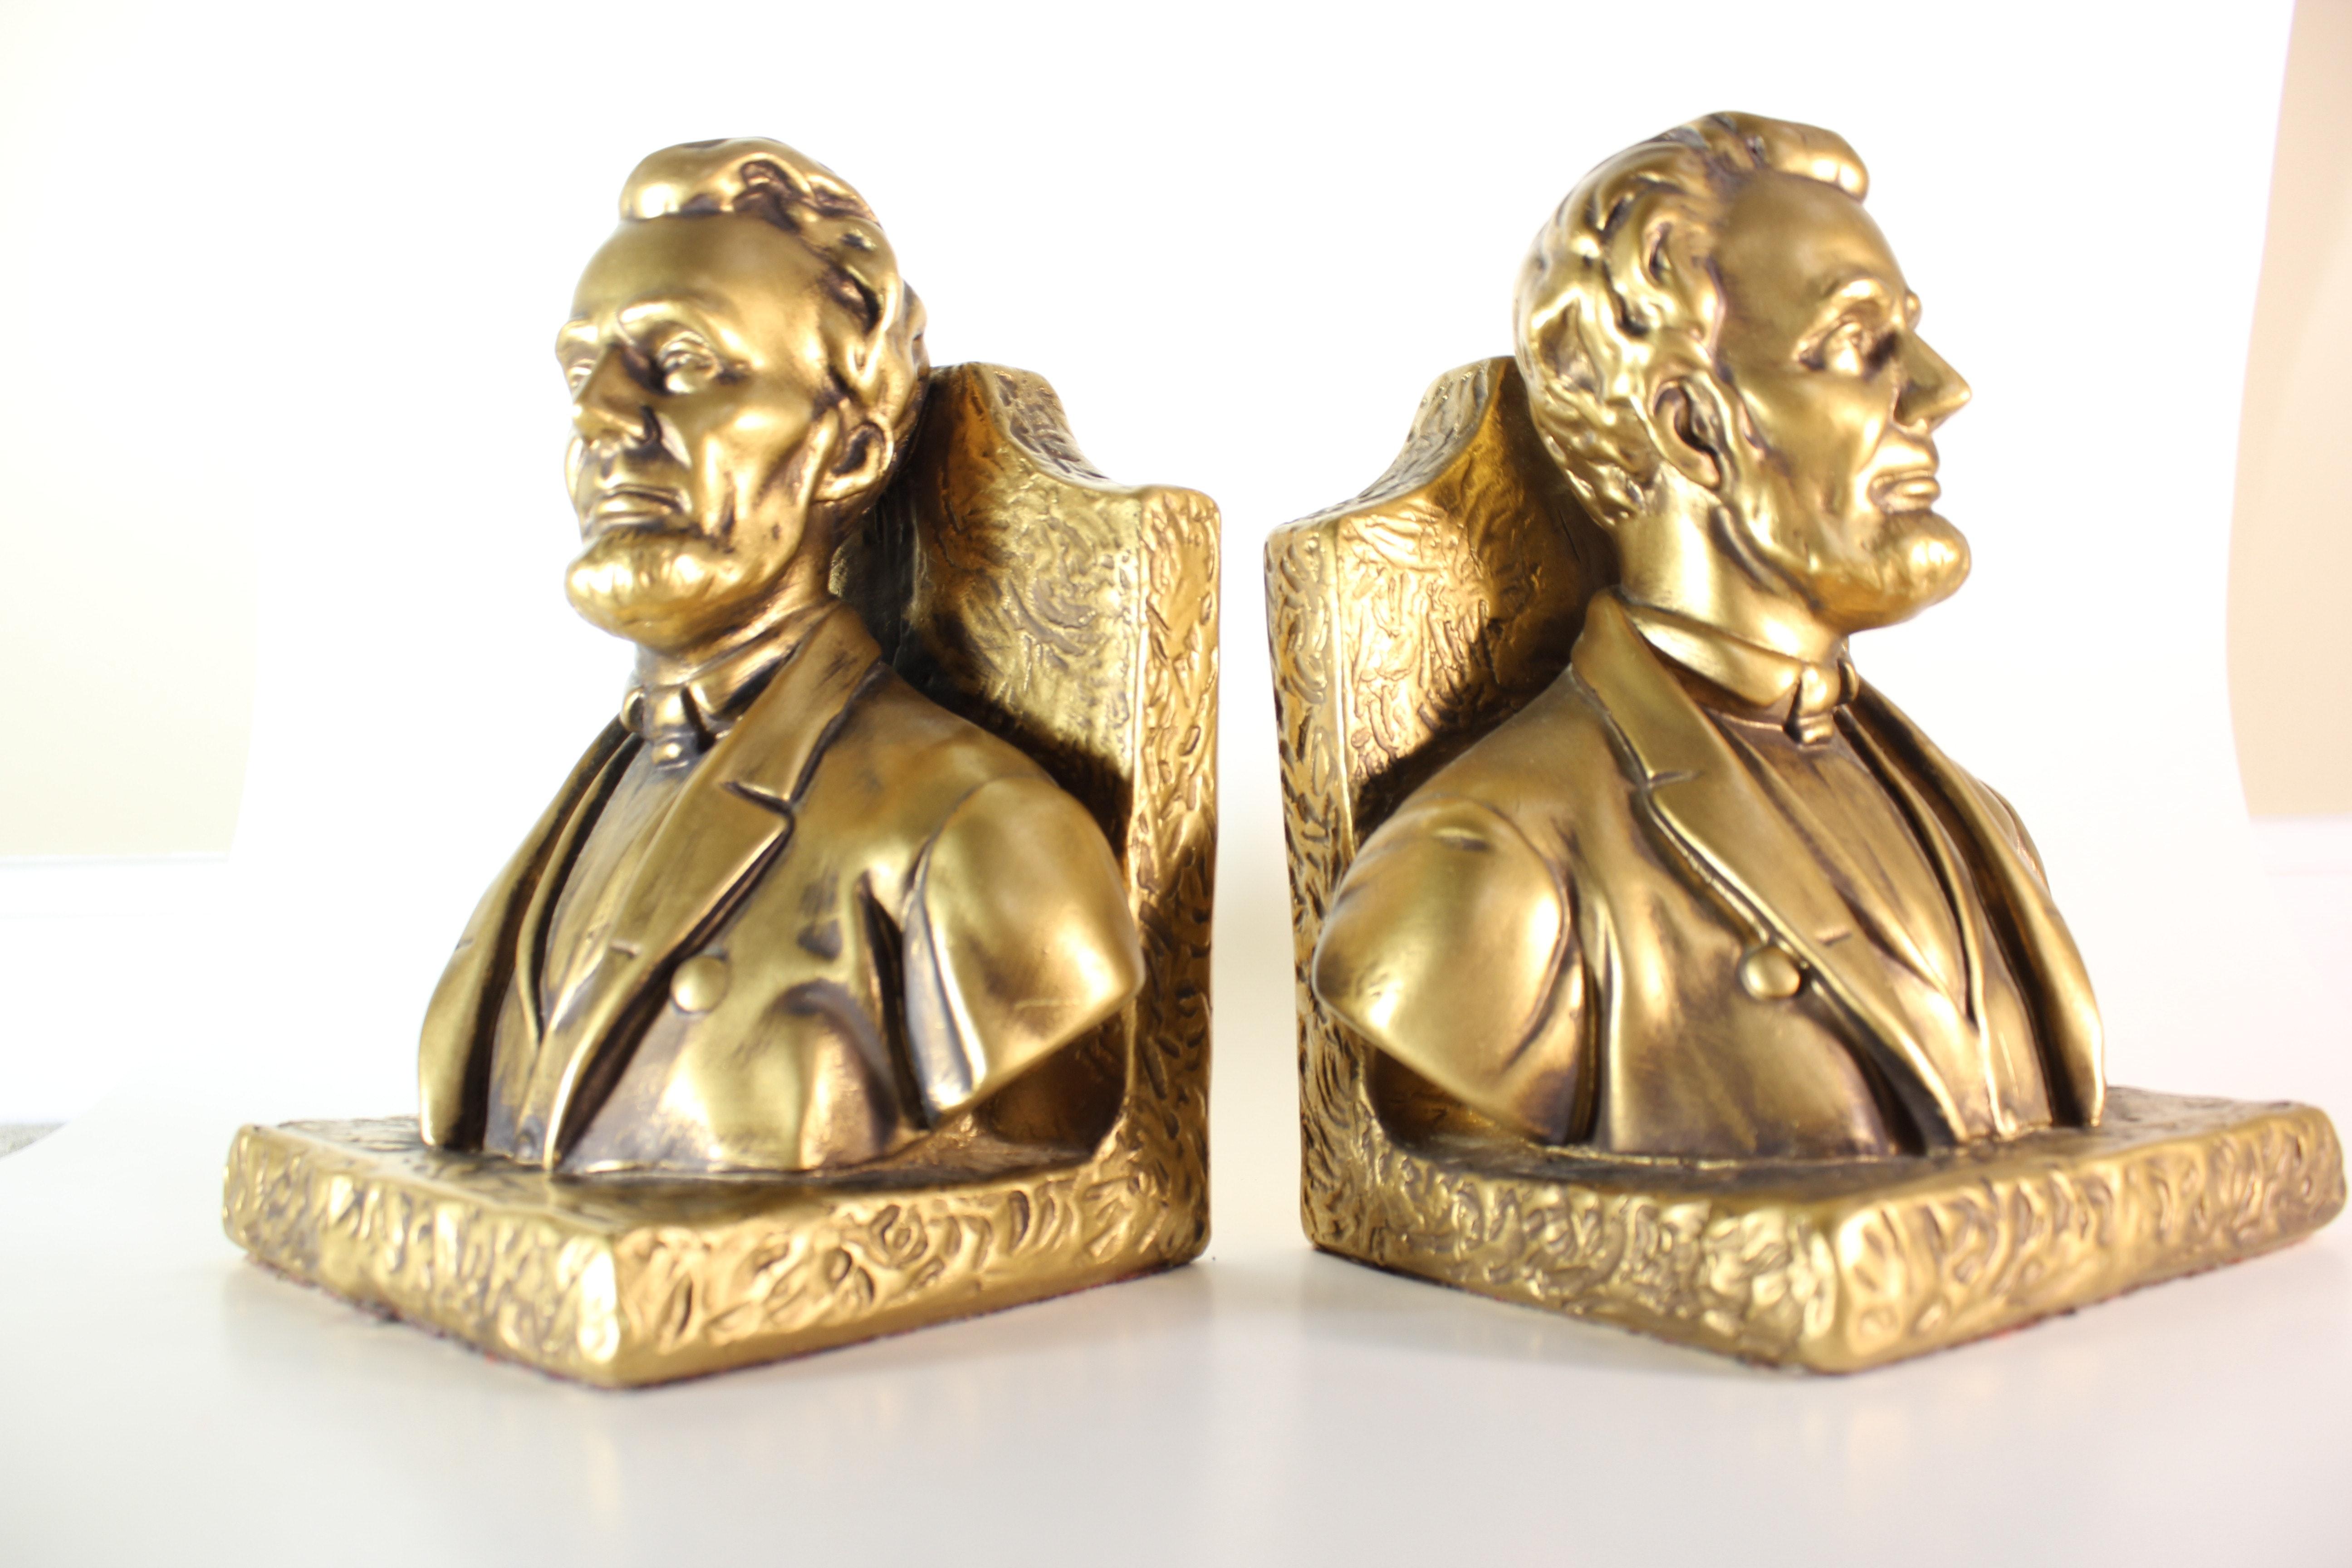 Set of Vintage Gold Abraham Lincoln Bookends